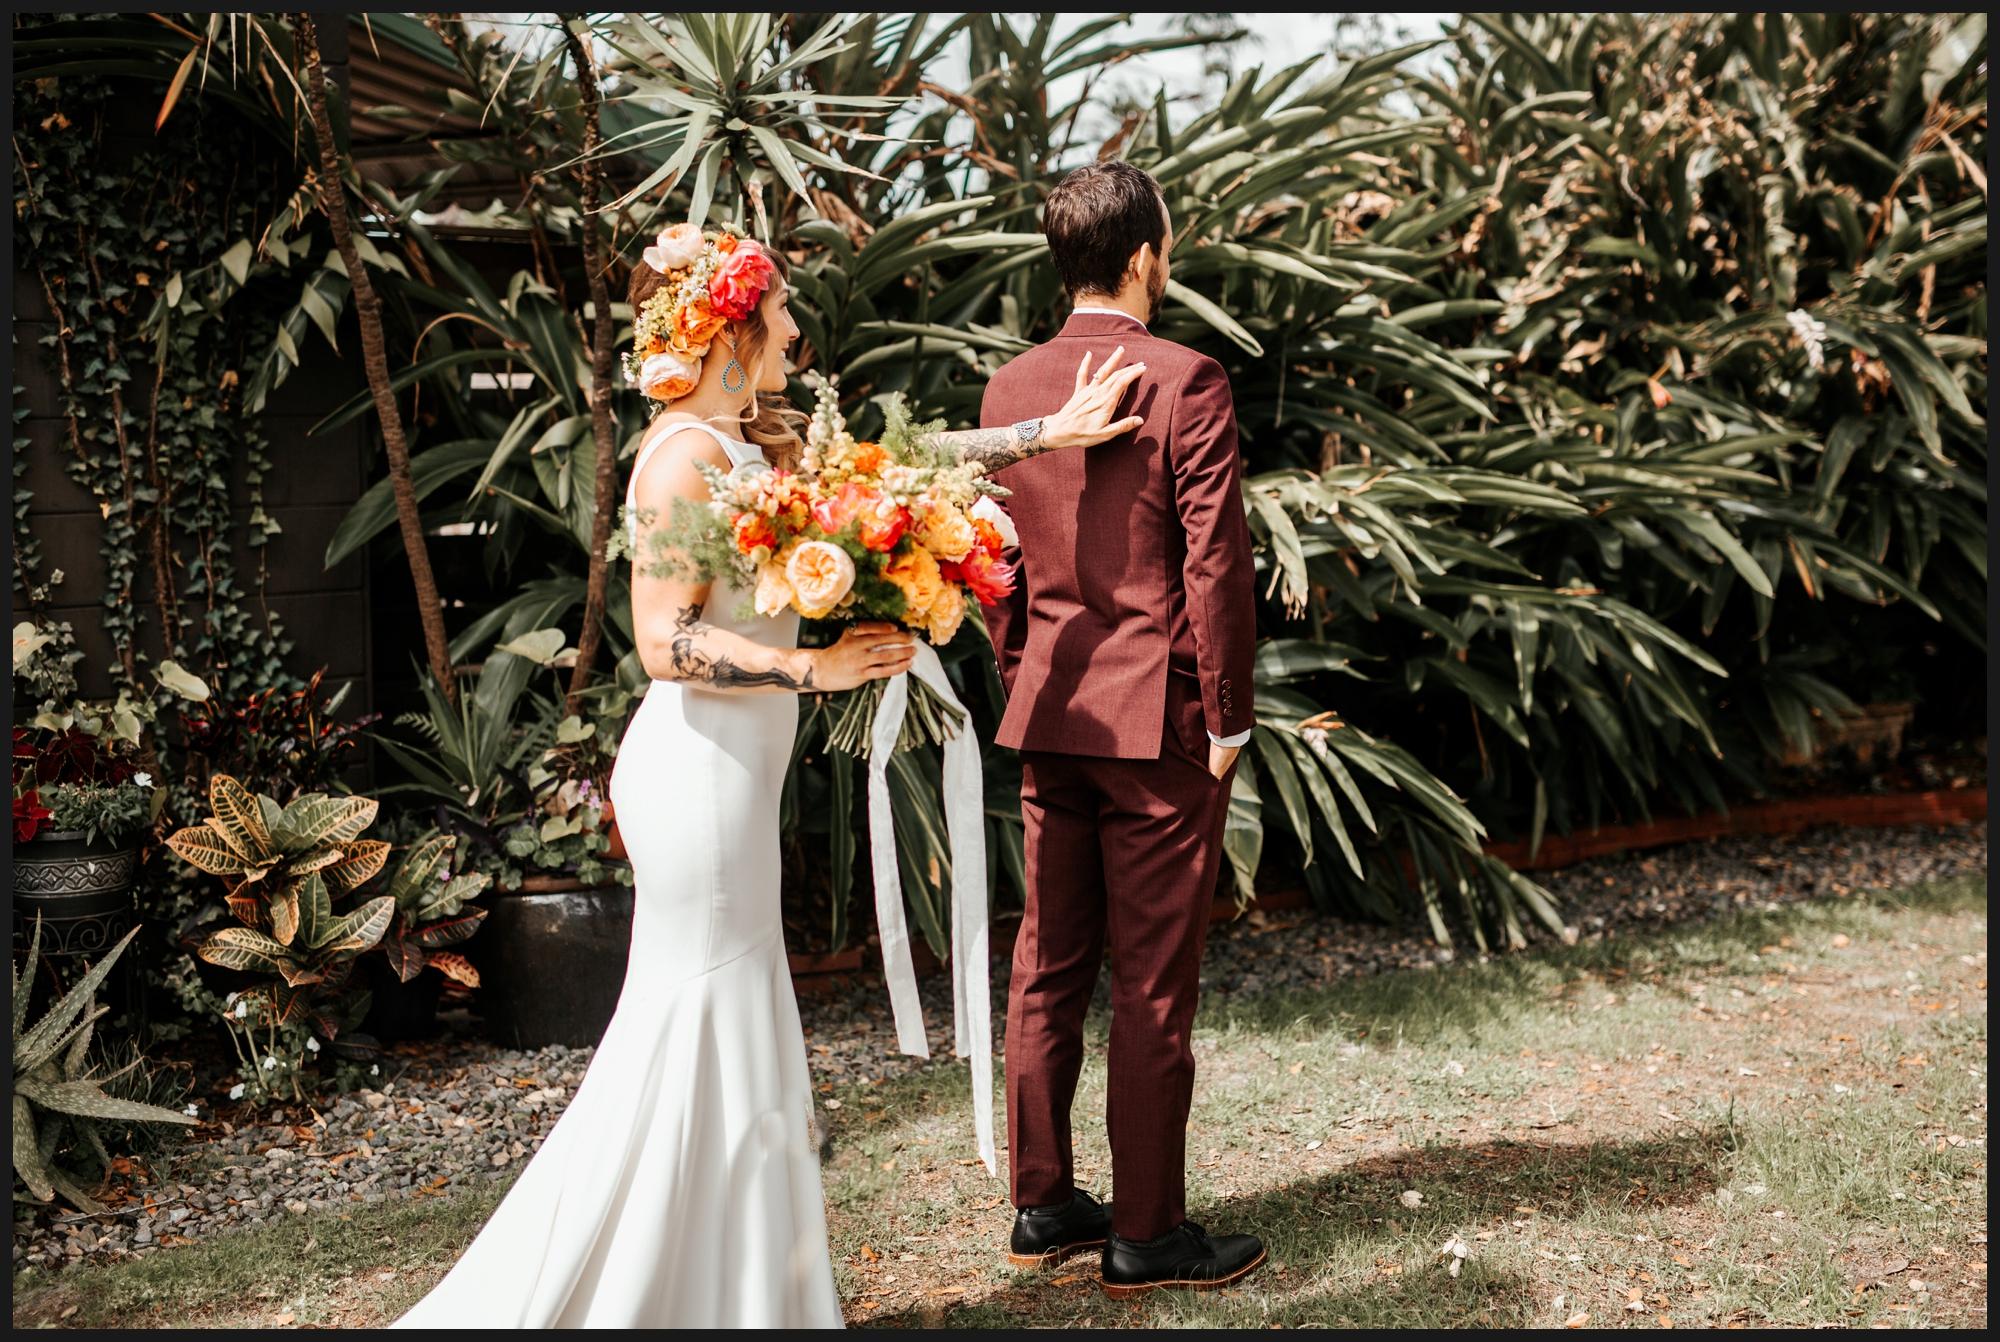 Orlando-Wedding-Photographer-destination-wedding-photographer-florida-wedding-photographer-bohemian-wedding-photographer_1972.jpg